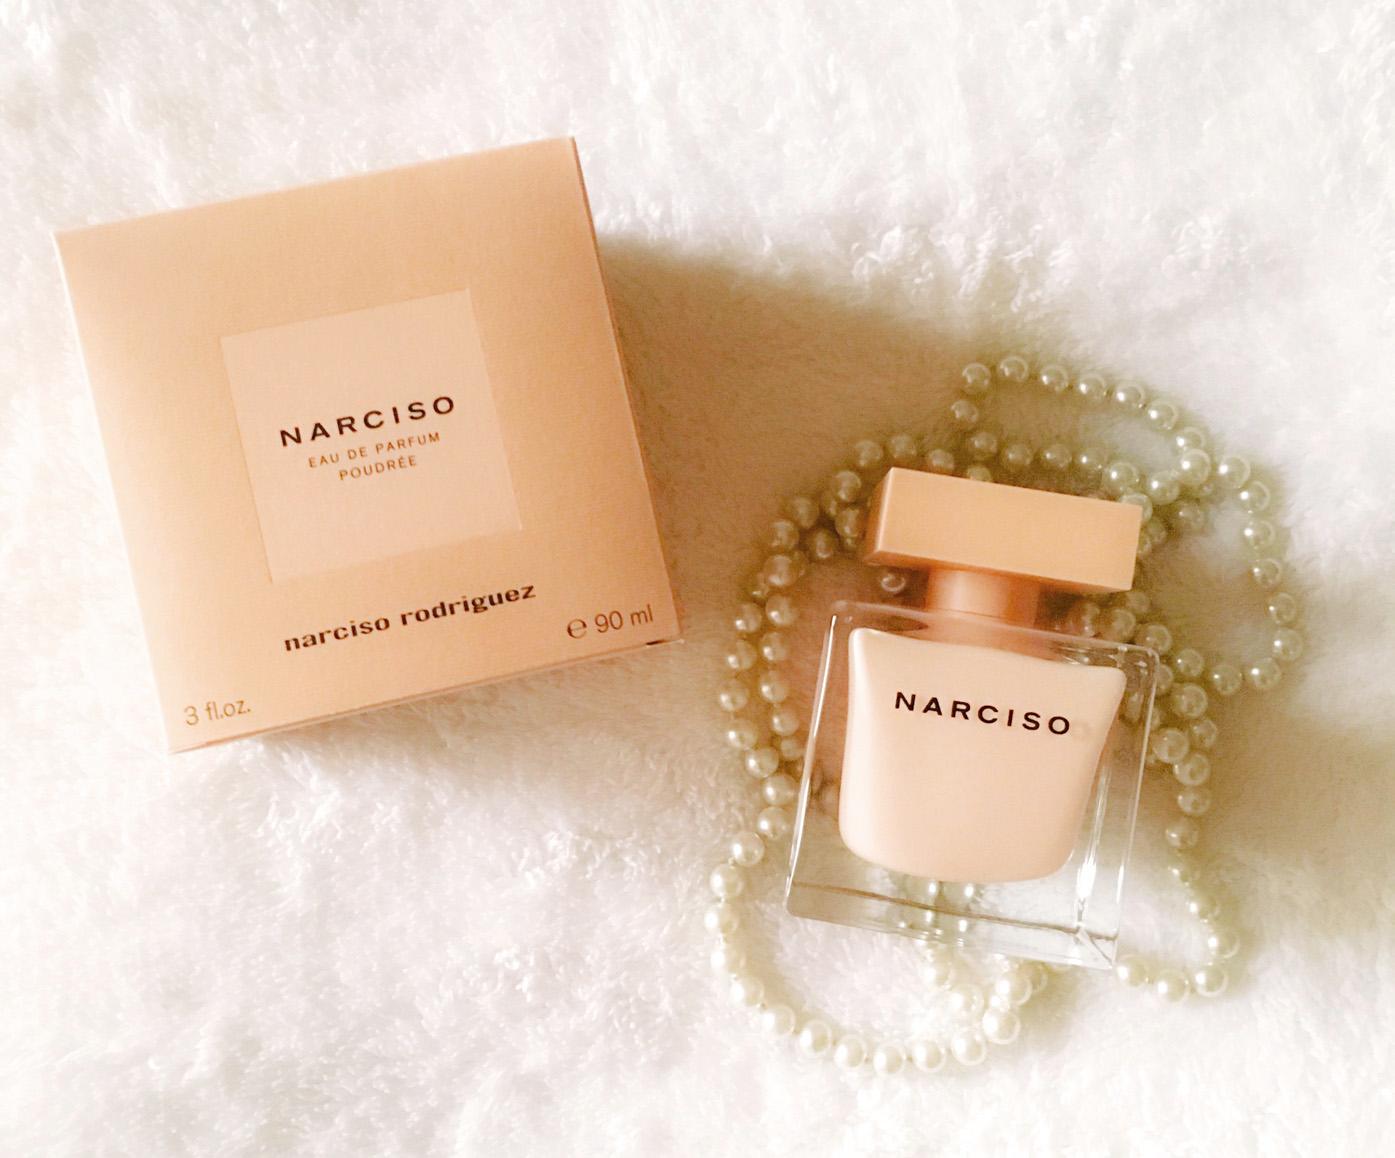 http://shopdep24h.com/images/nuoc-hoa-nu-full-size/narciso-rodriguez-poudree-chai-nude-edp-90ml/fullsizerender12.jpg